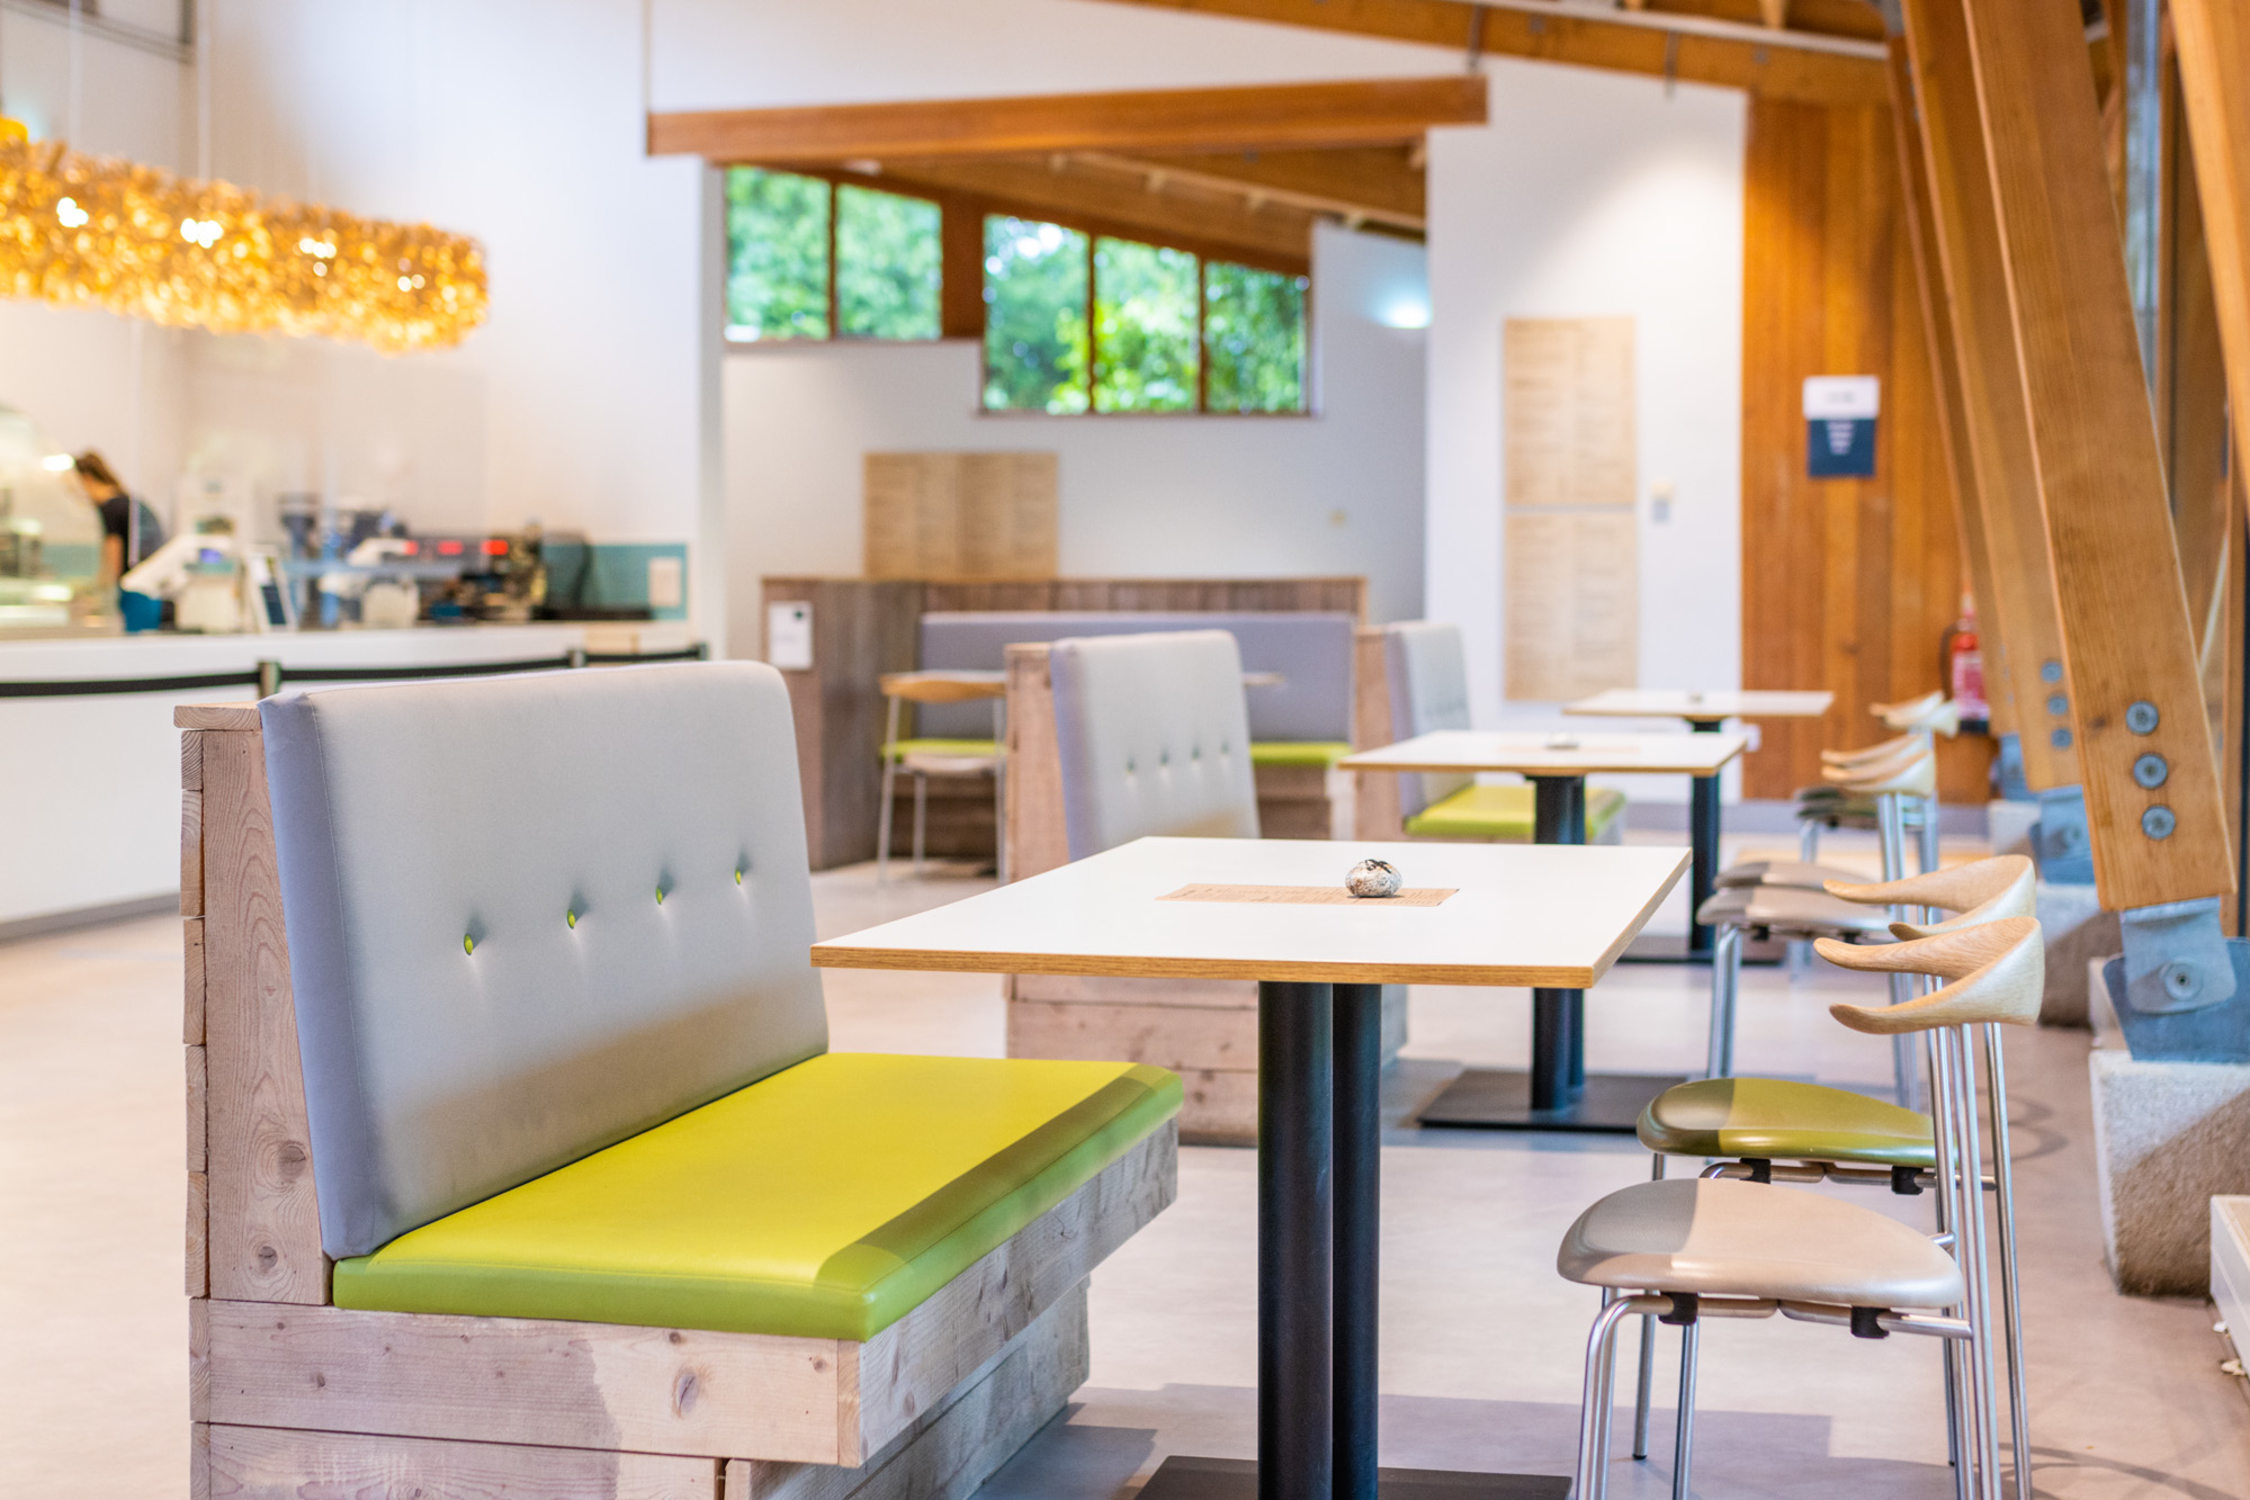 Trebah 'Street' Kitchen Is Back Open